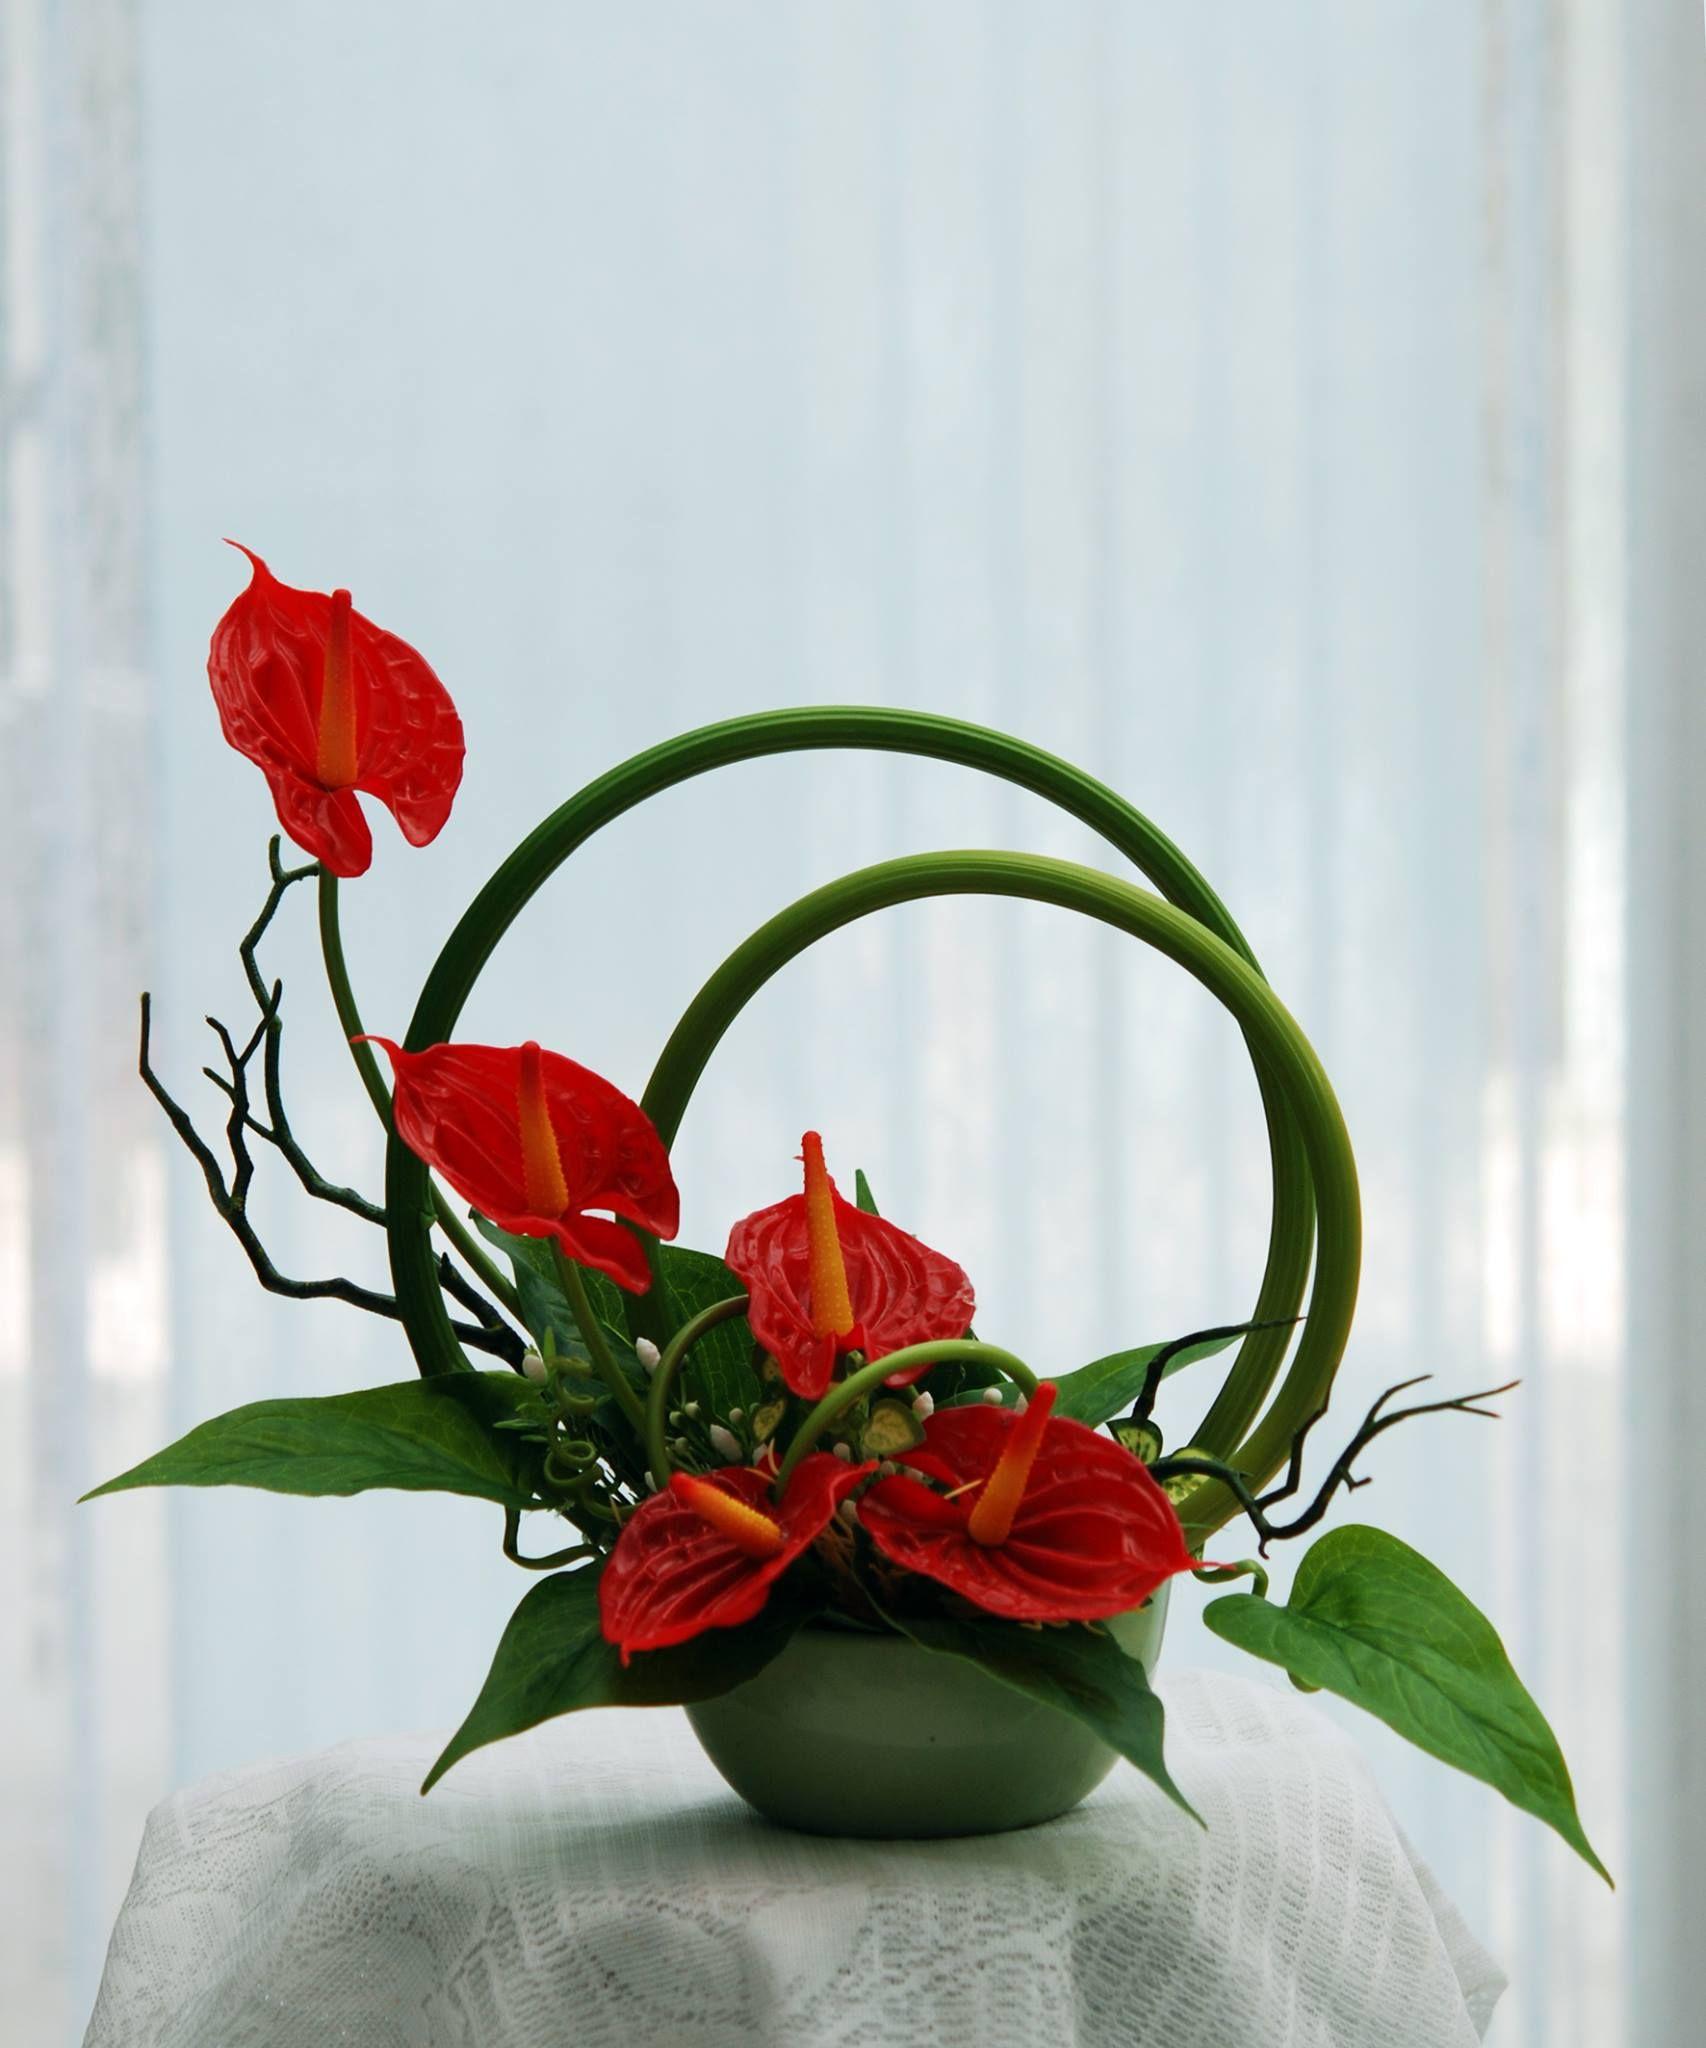 ikebana son thanh nguyen floristeria pinterest blumengestecke blumen und gestecke. Black Bedroom Furniture Sets. Home Design Ideas